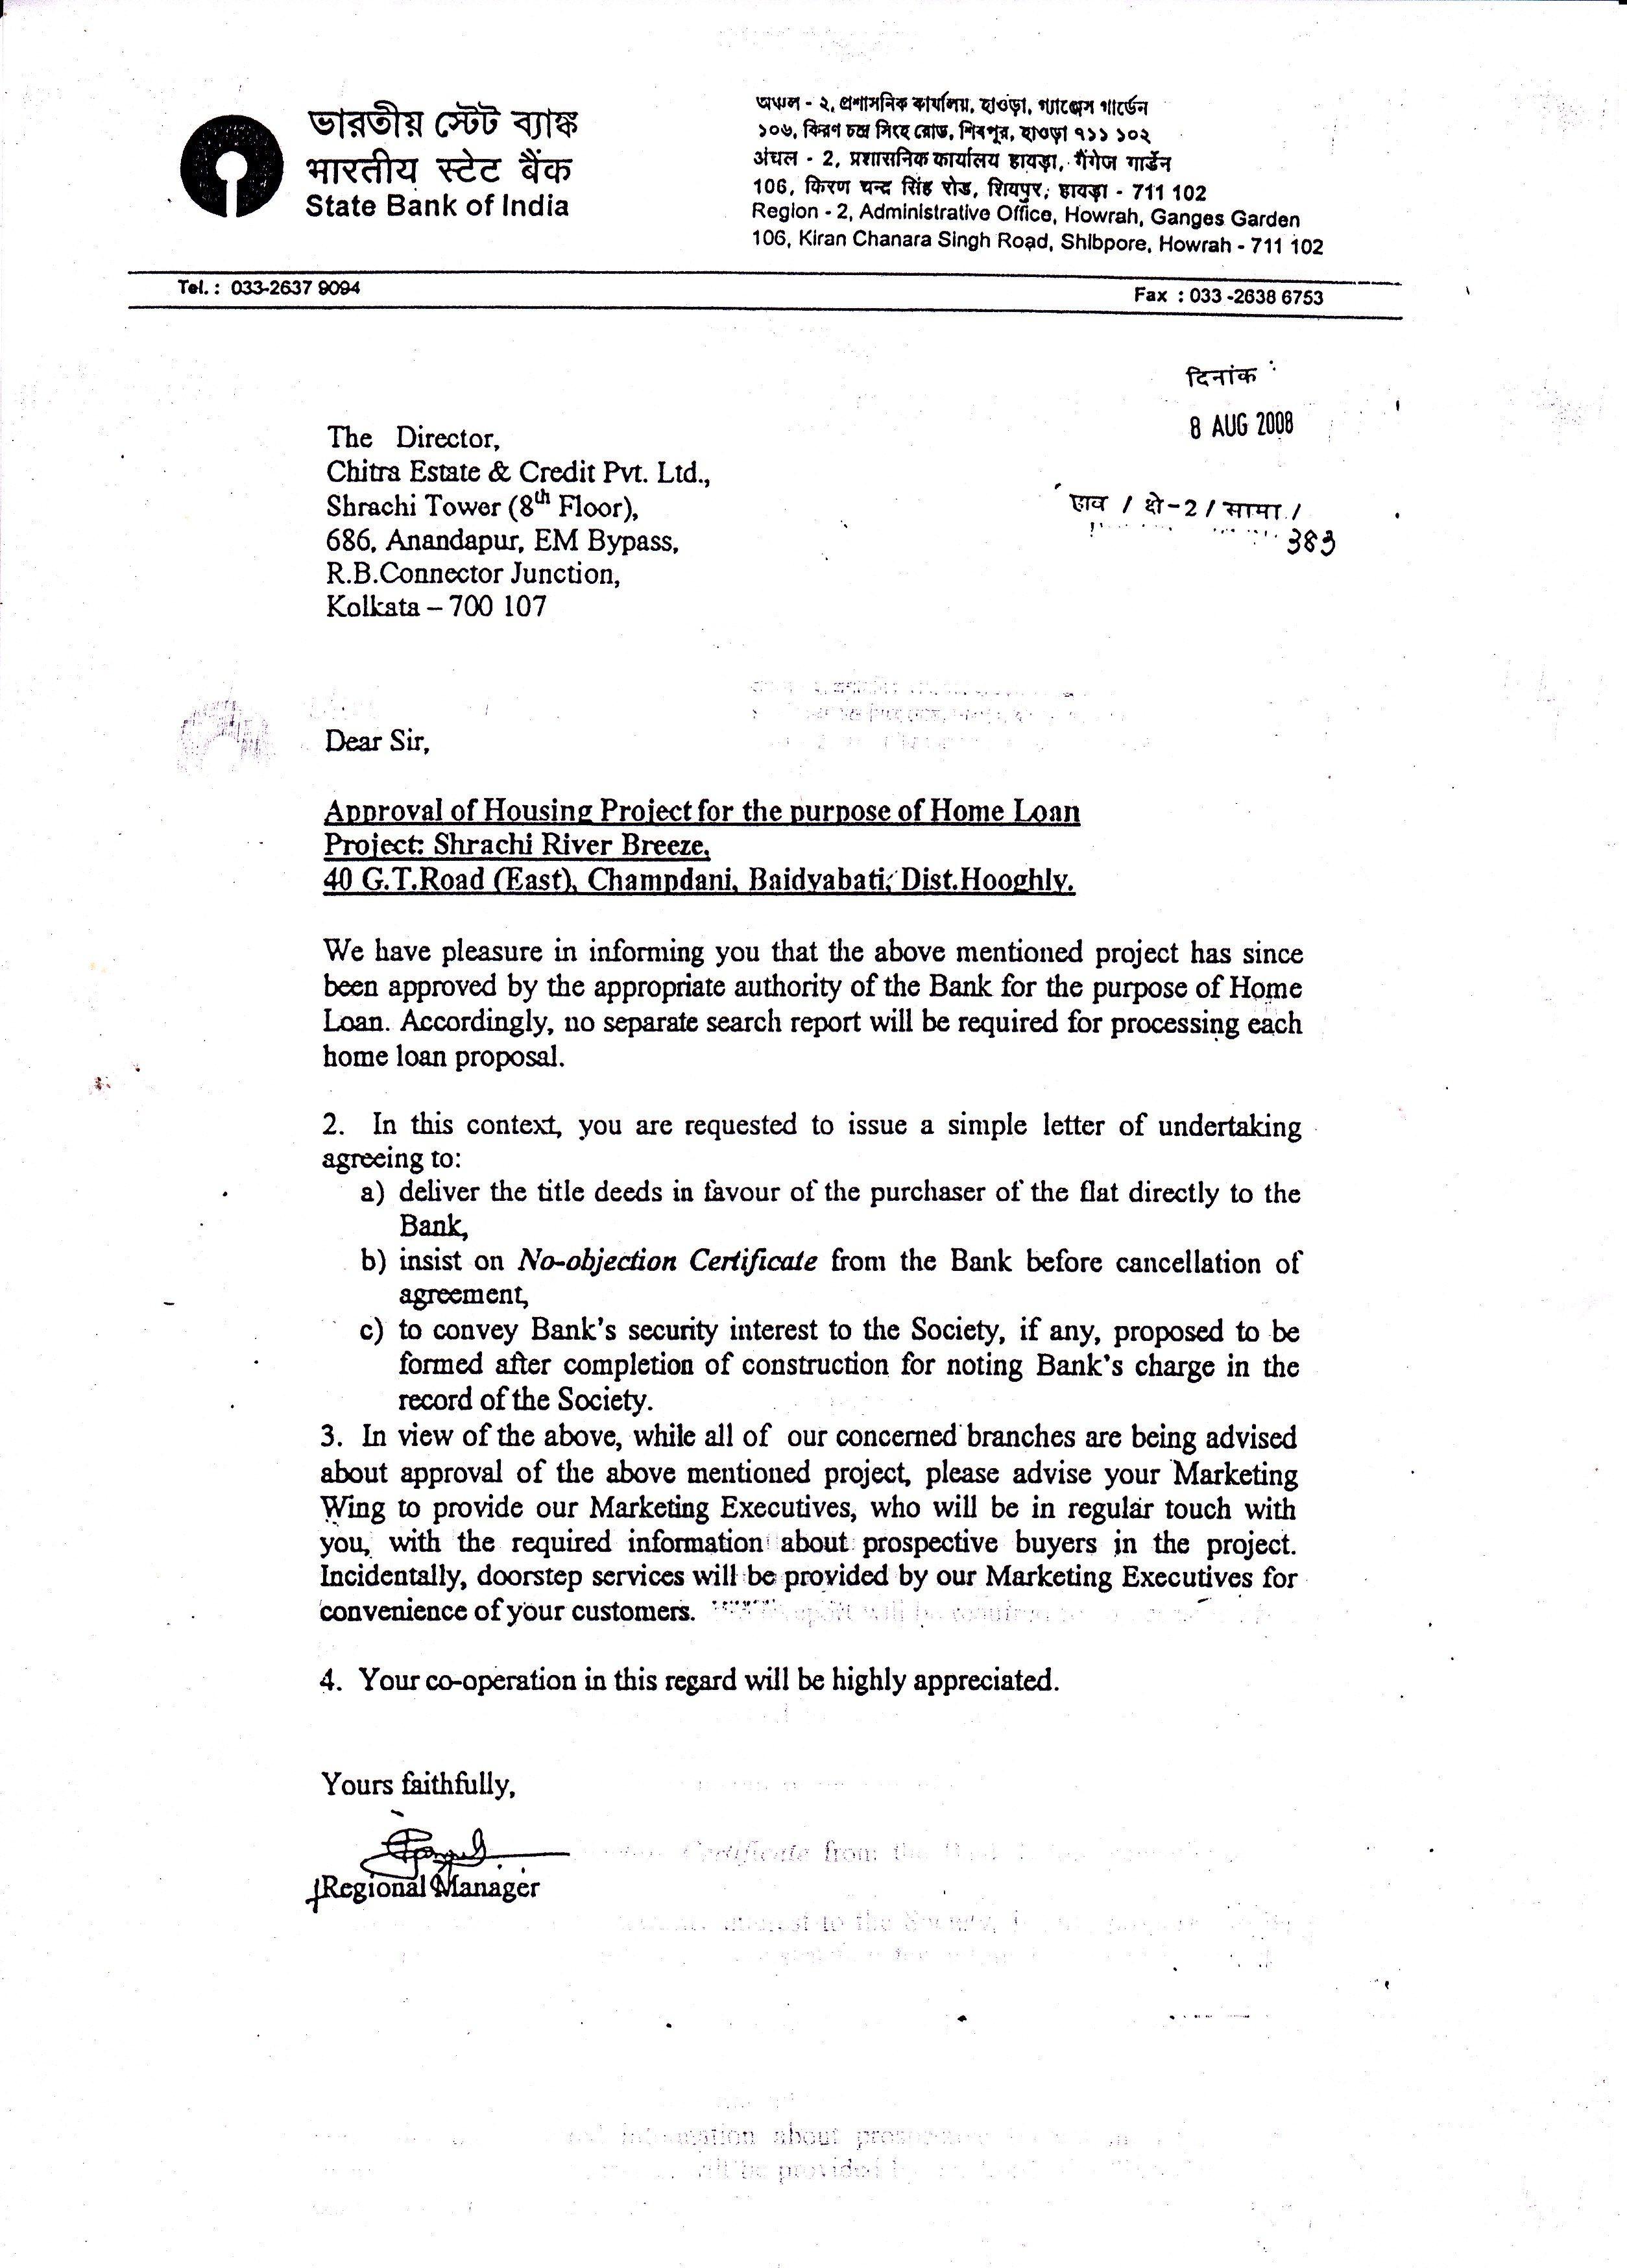 Formal Offer Letter Template - Application Letter for A Bank Clothing Business Proposal Letter